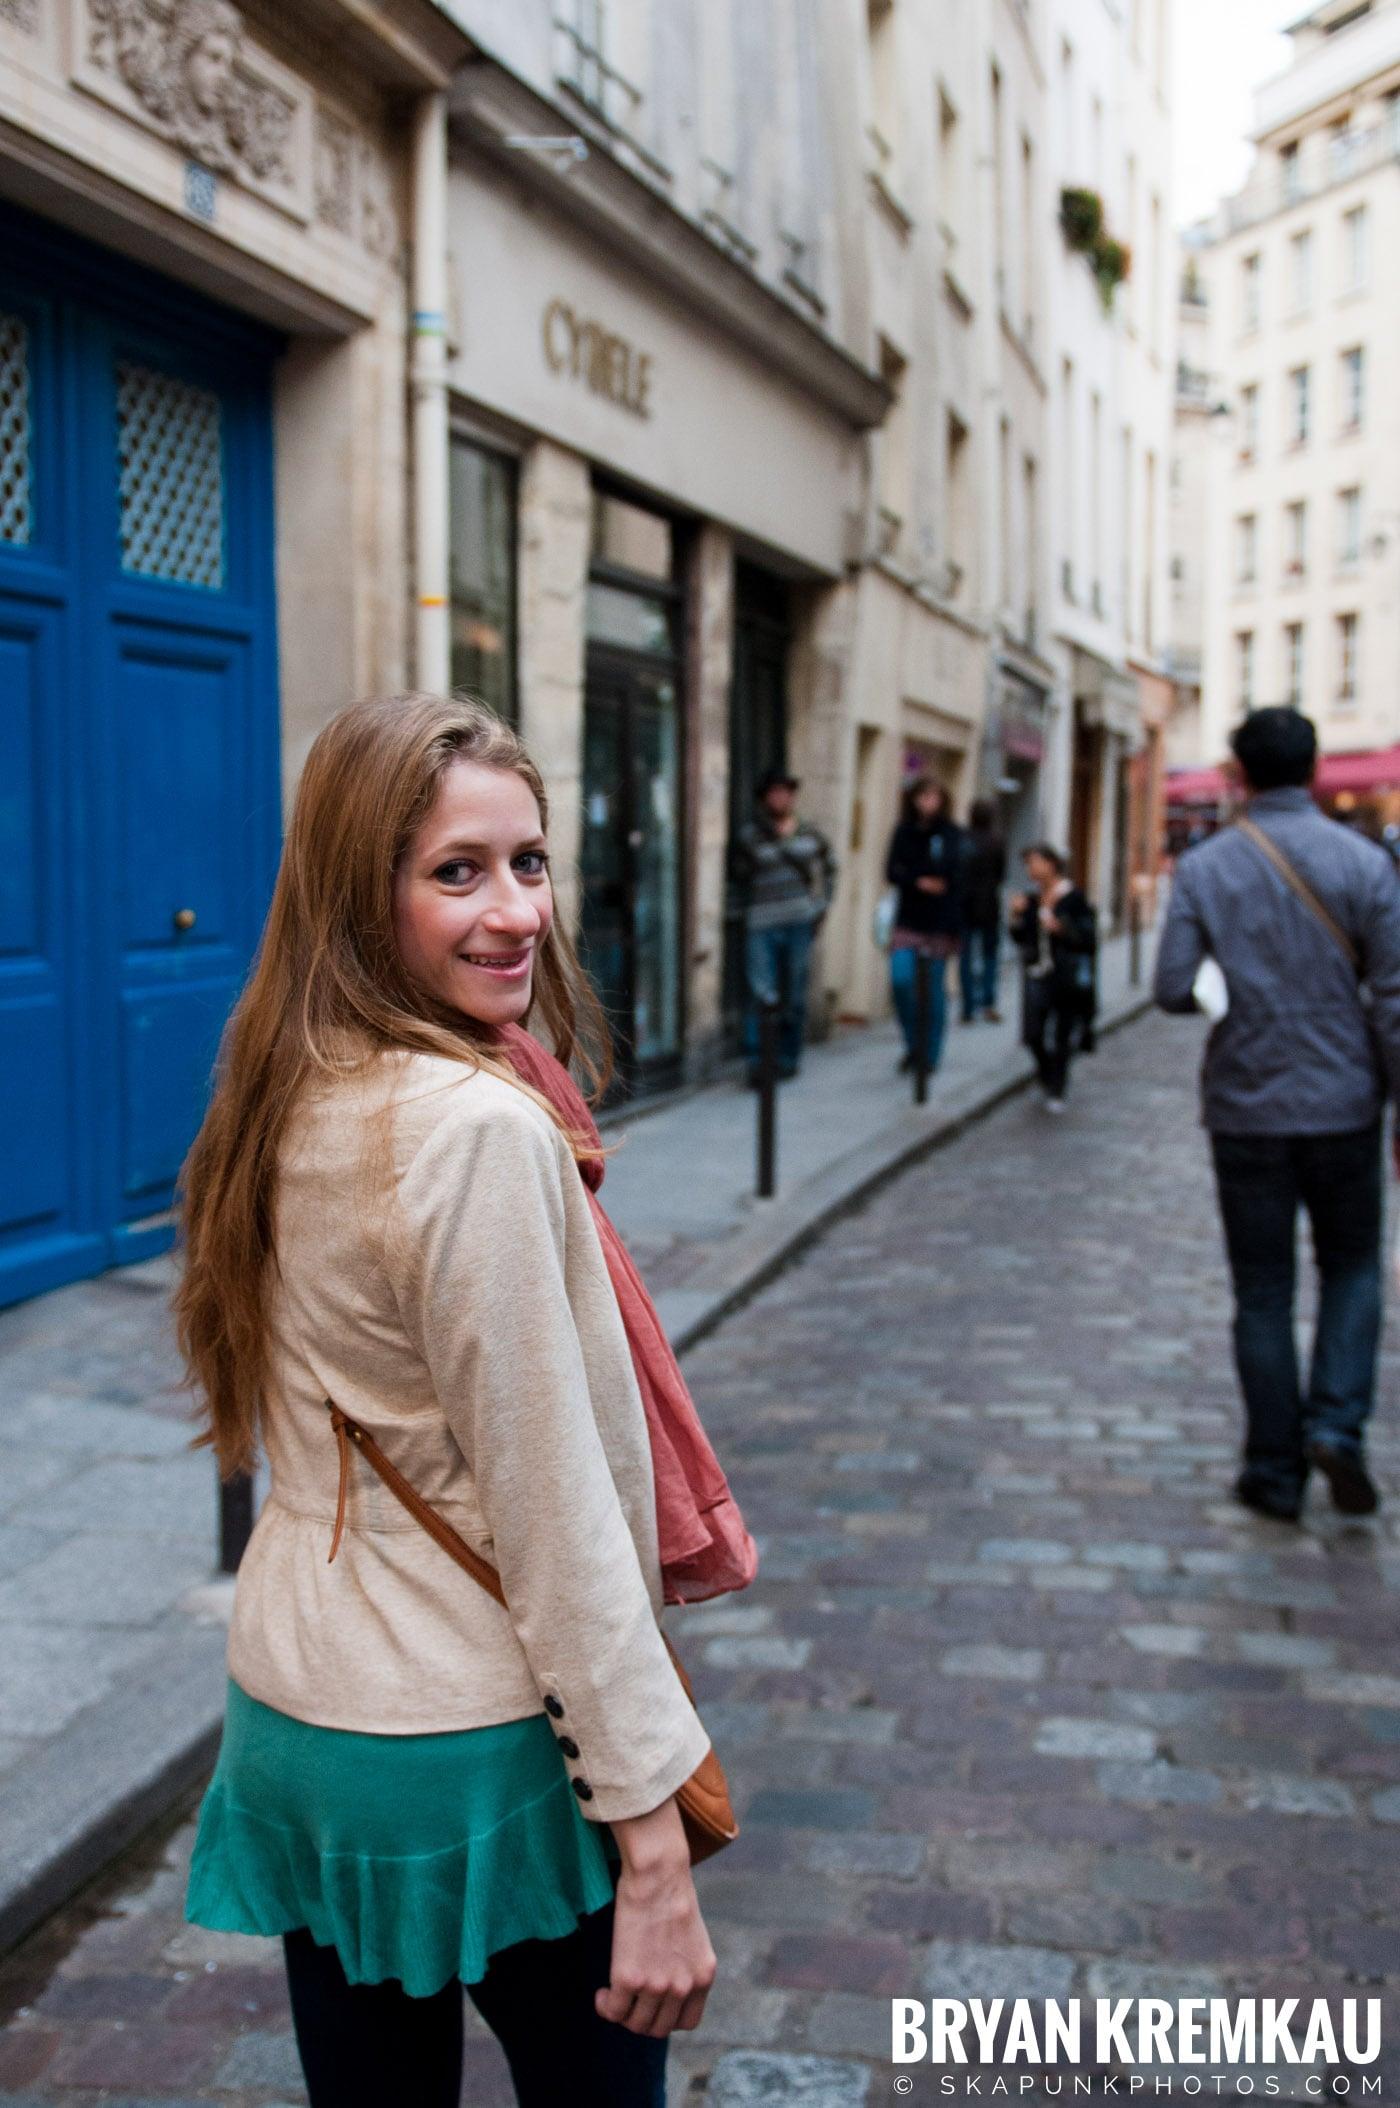 Paris, France Honeymoon - Day 4 - 7.21.11 (105)